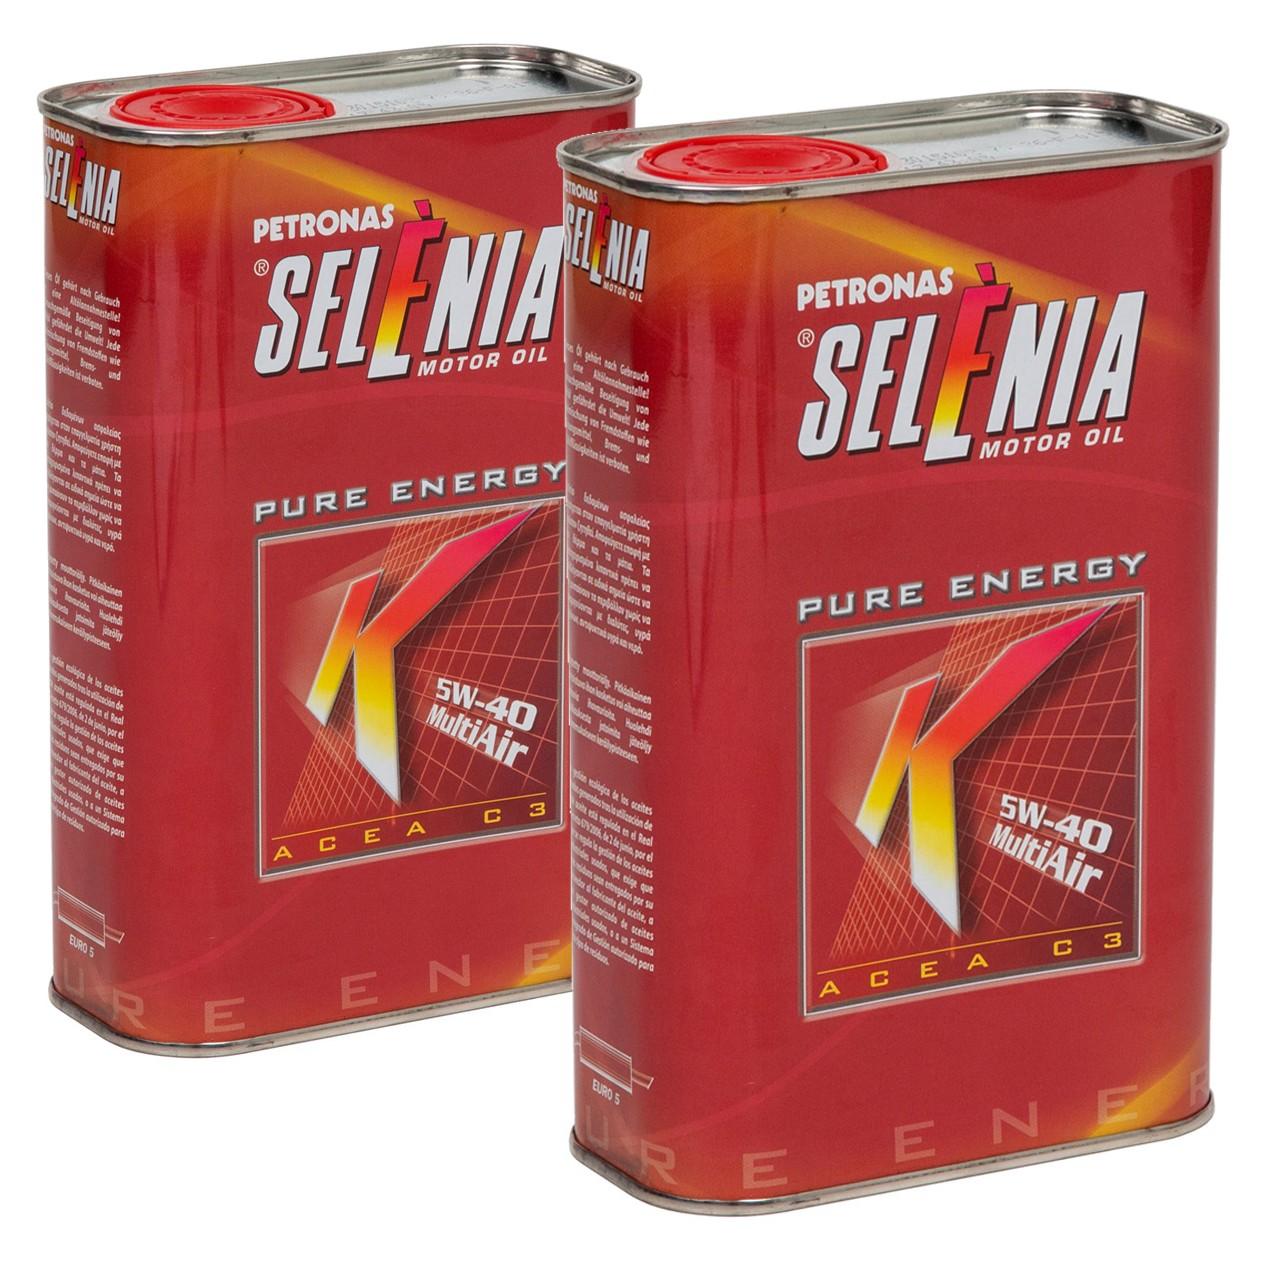 PETRONAS SELENIA Motoröl Öl K PURE ENERGY 5W40 5W-40 Fiat 9.55535-S2 - 2 Liter